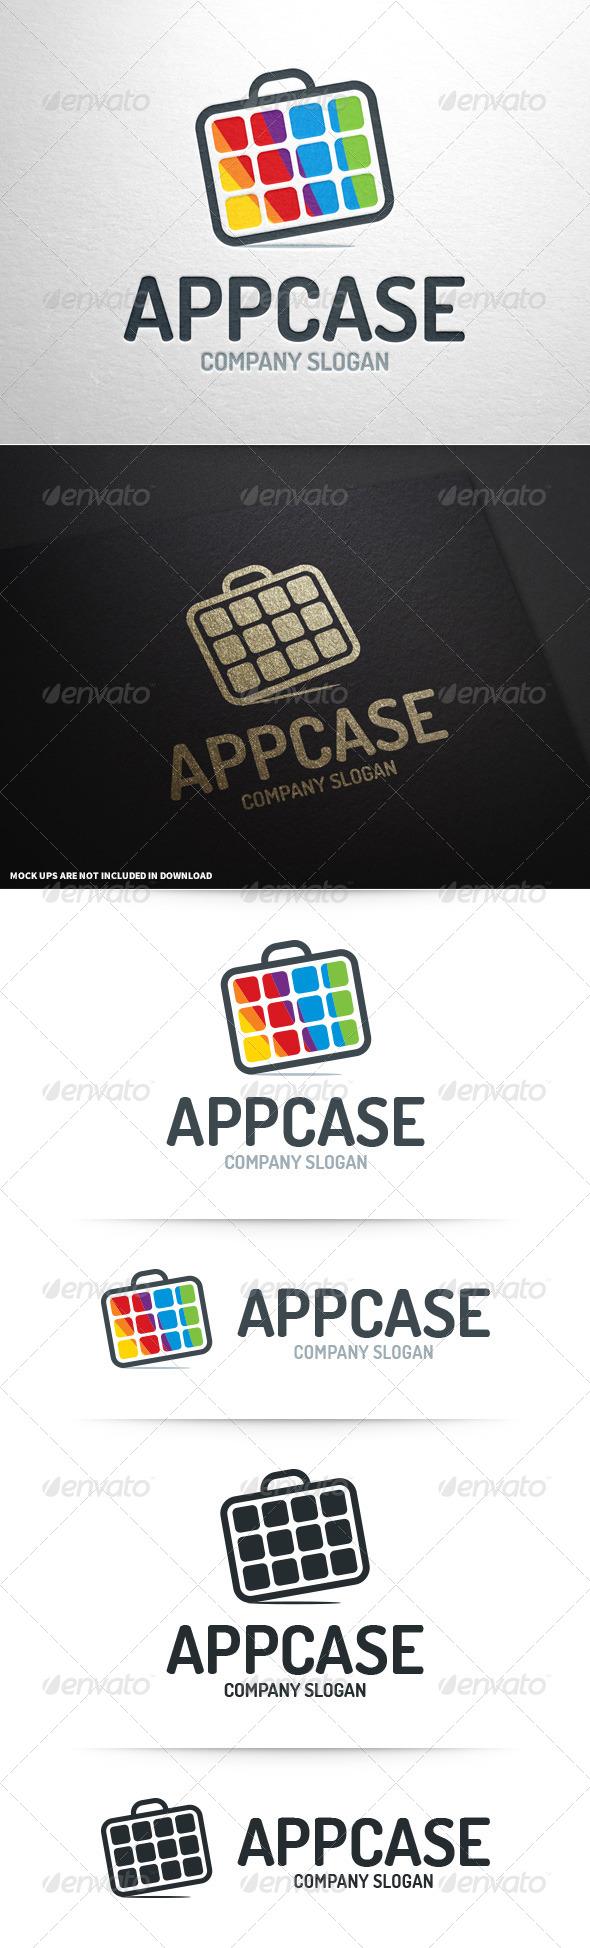 App Case Logo Template